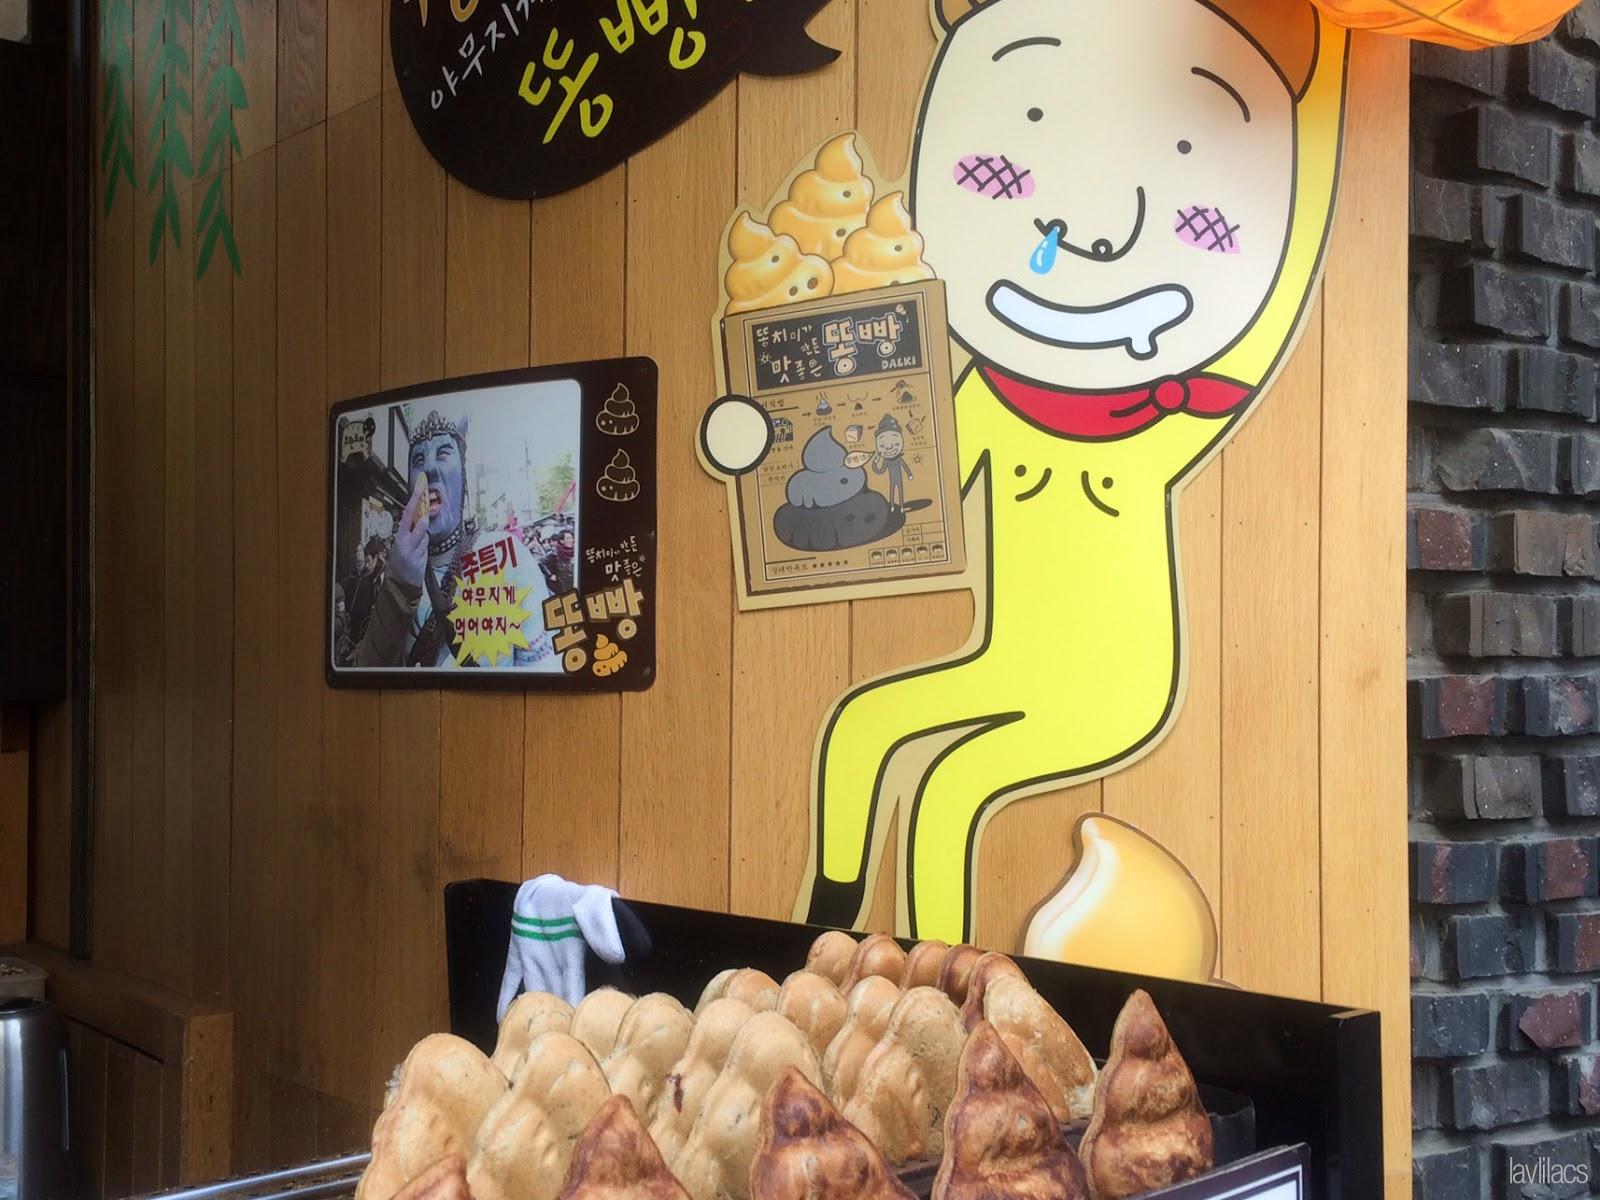 Seoul, Korea - Summer Study Abroad 2014 - Seoul City Touring - Insadong 인사동 仁寺洞 - Ssamziegil 쌈지길 poop bread 똥빵